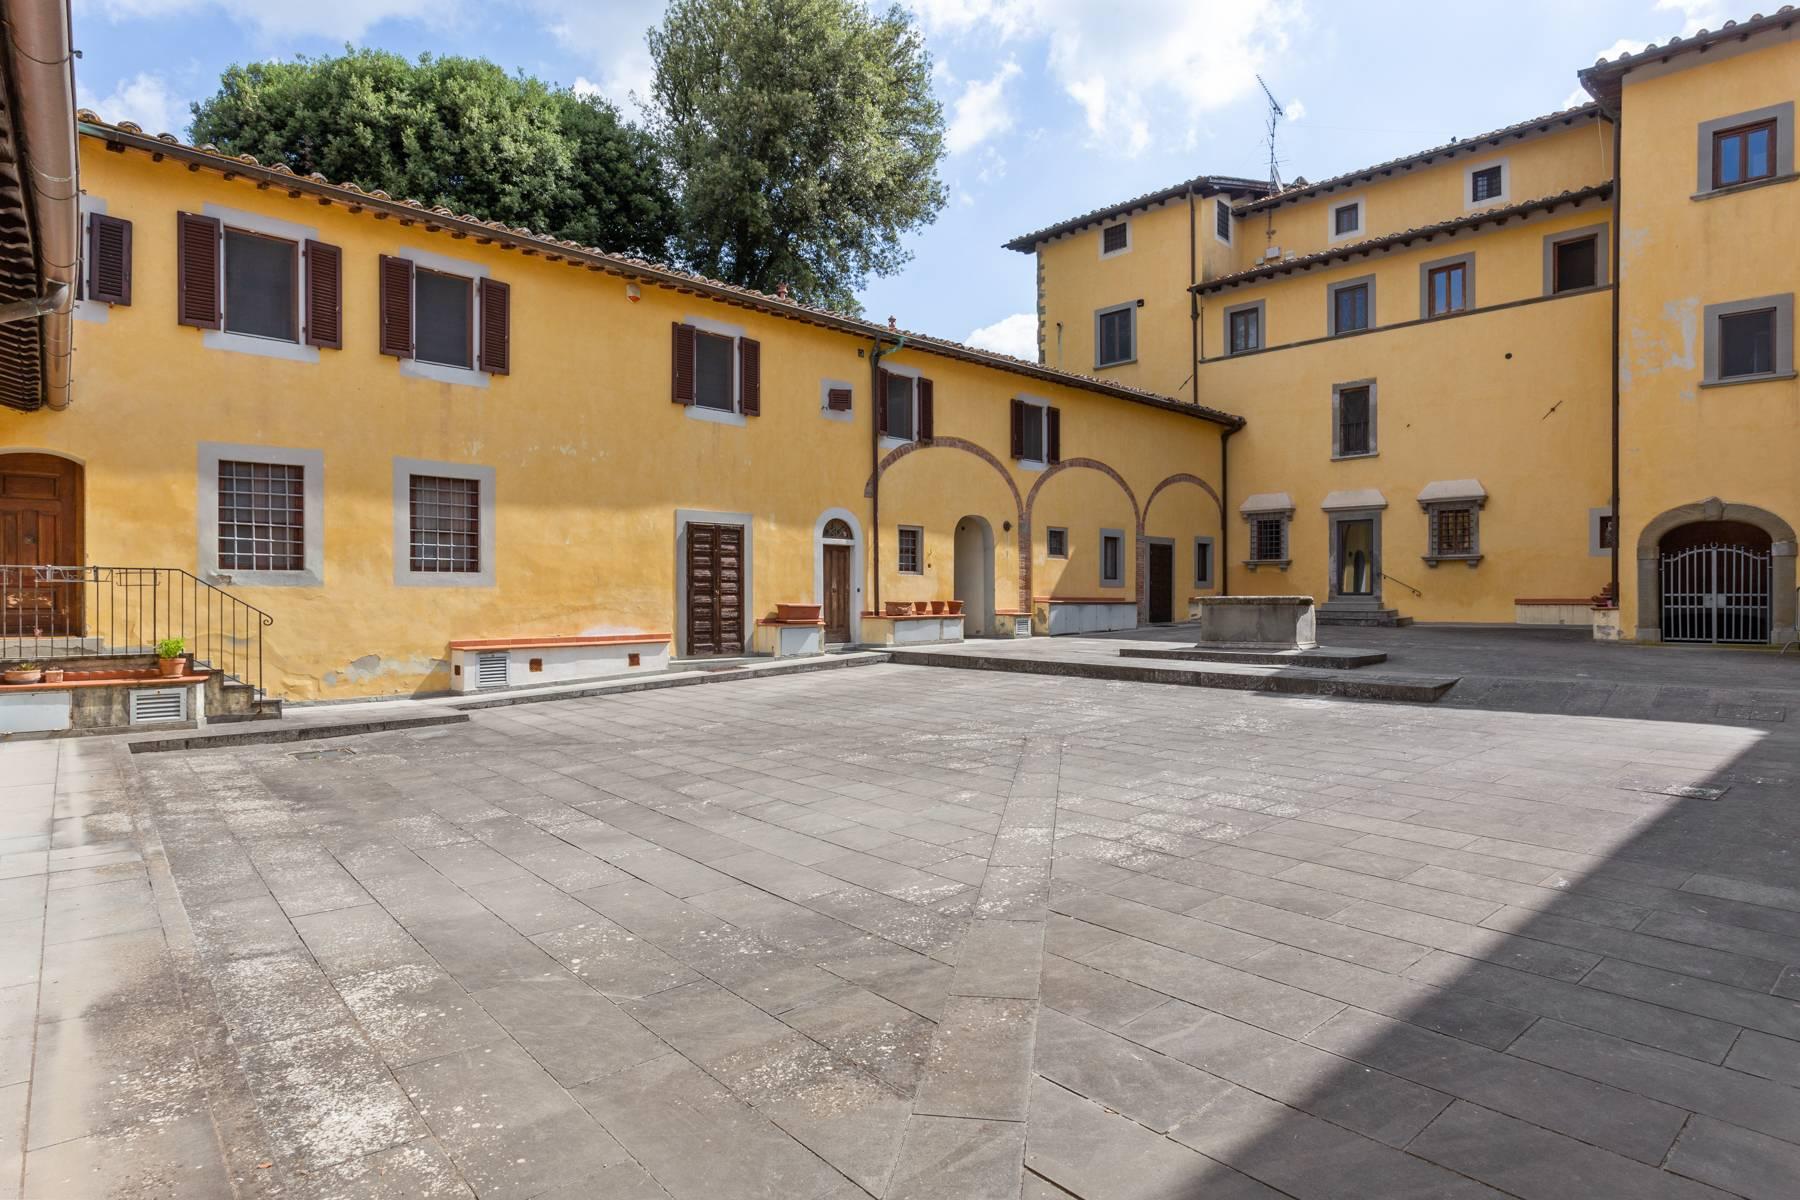 Appartamento in Vendita a Scandicci: 5 locali, 170 mq - Foto 21